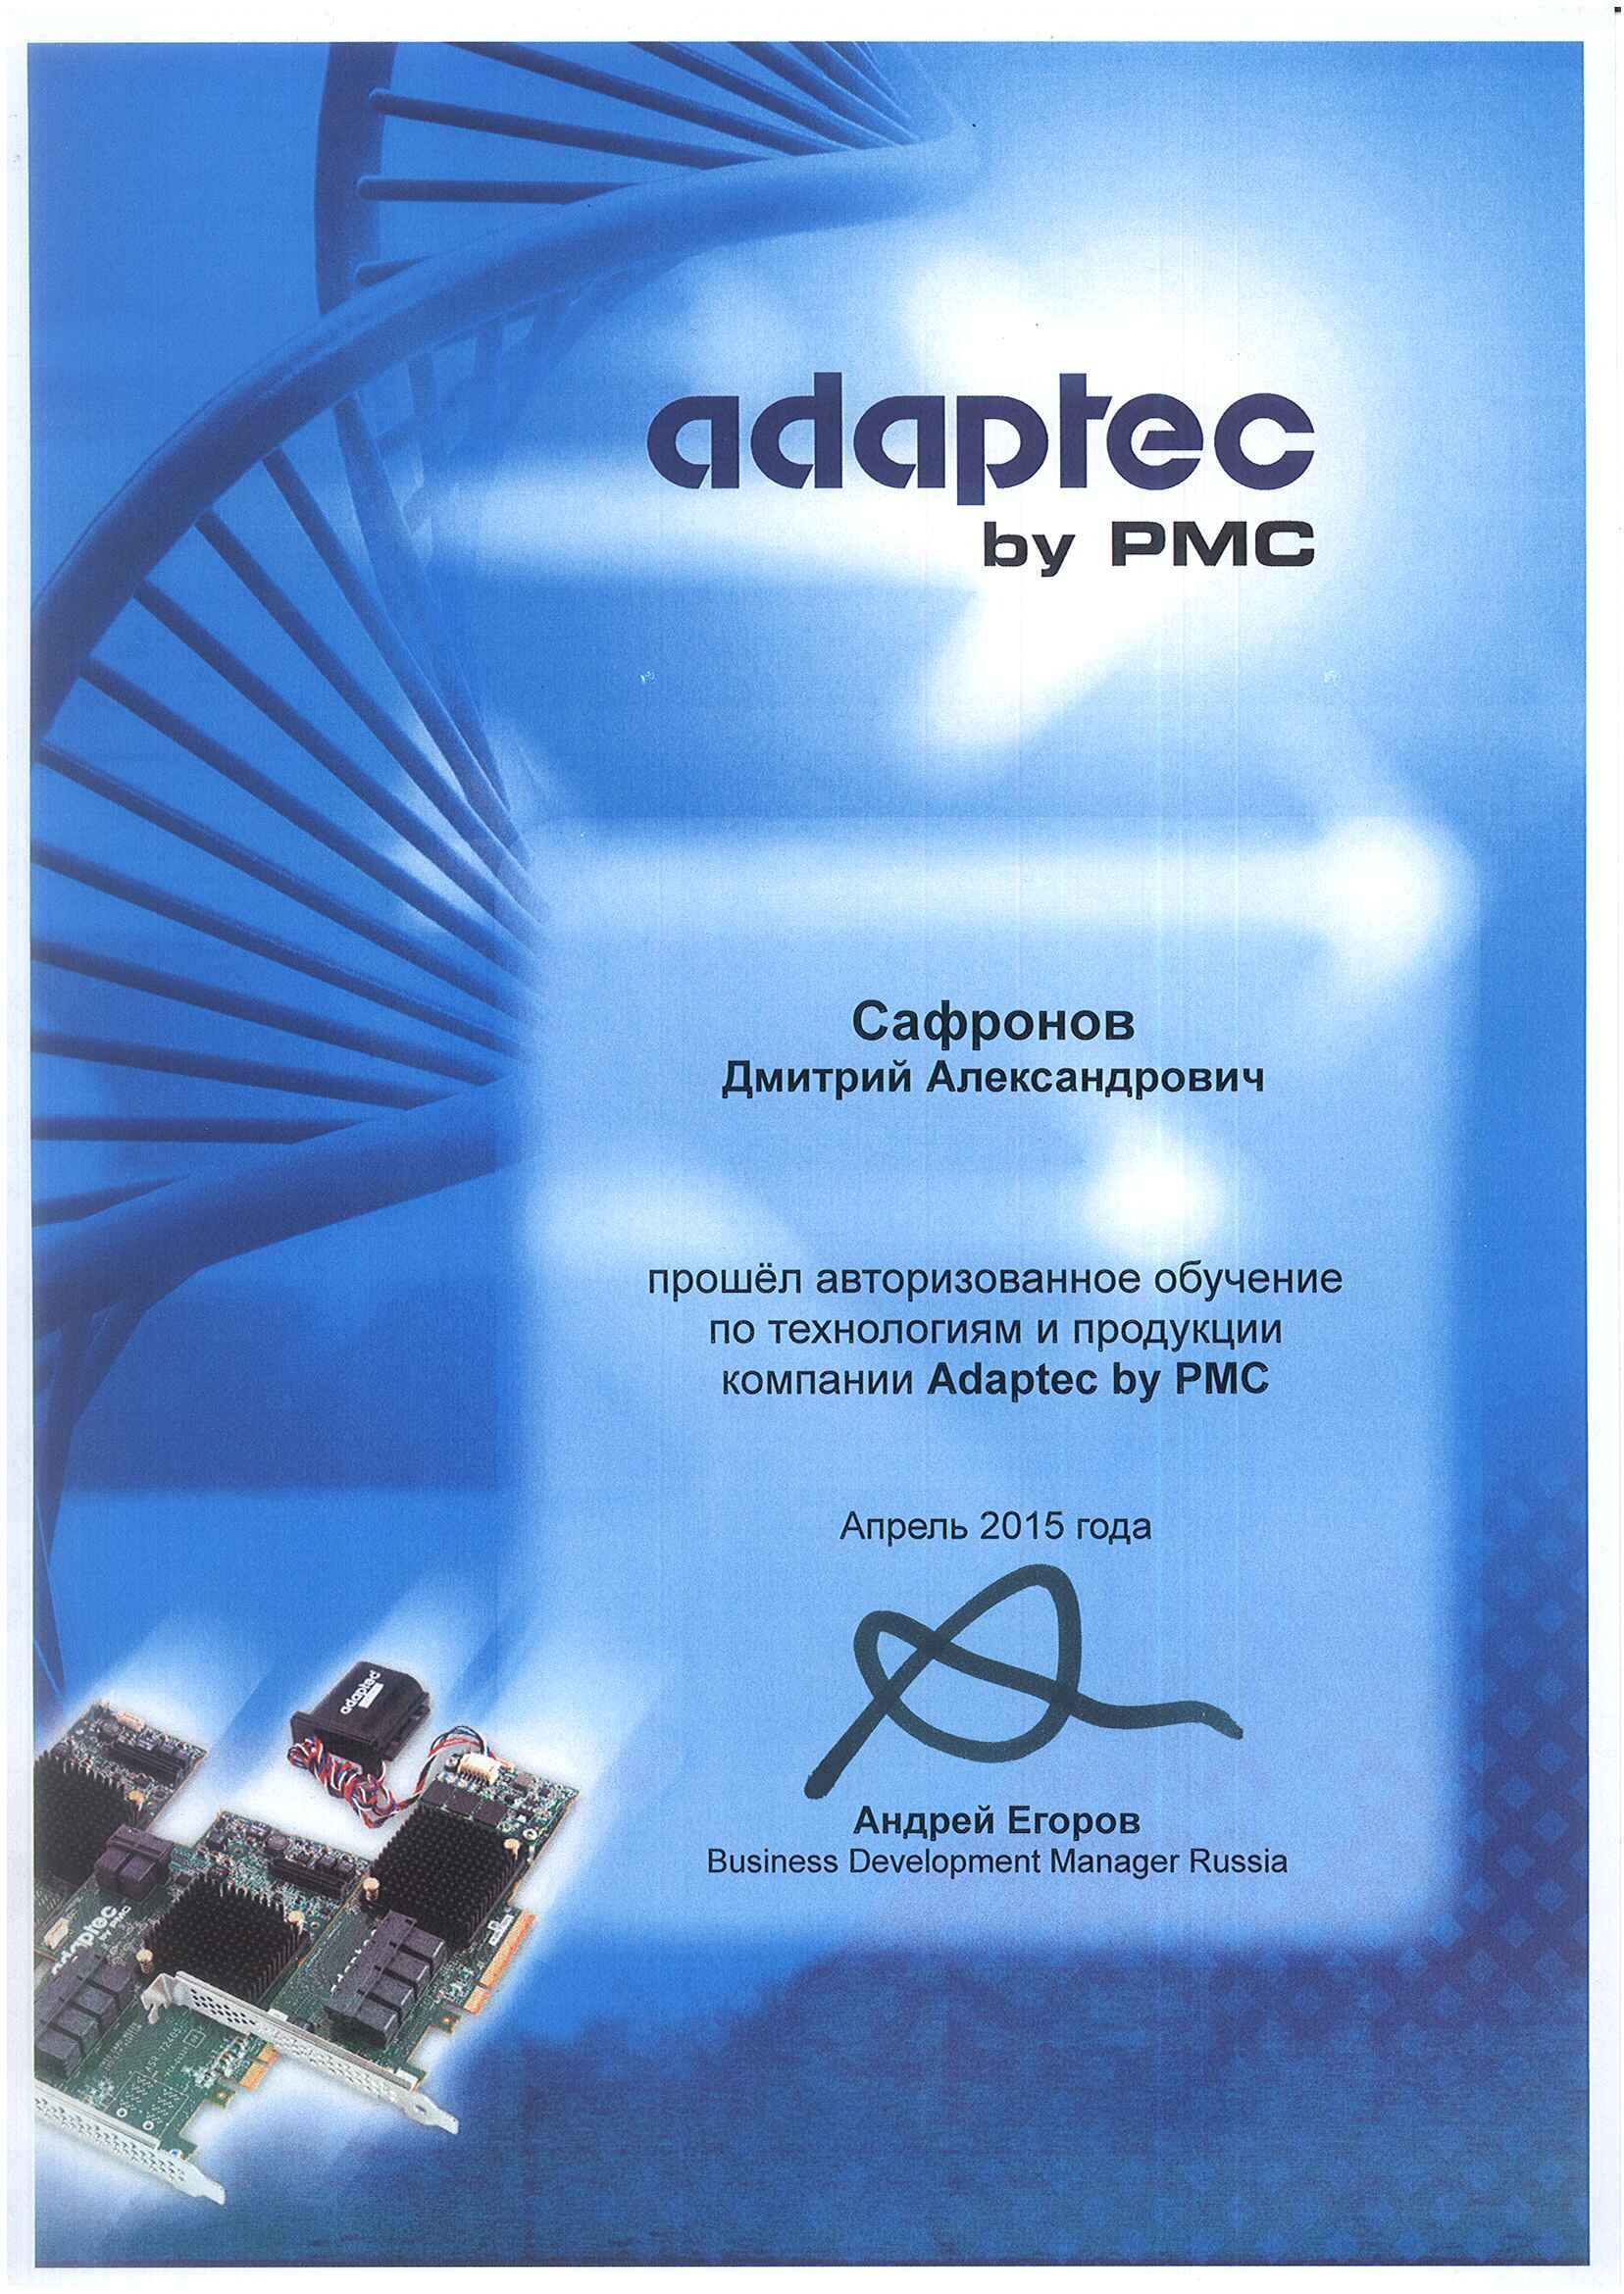 Сертификат Adaptec-Сафронов Дмитрий Александрович